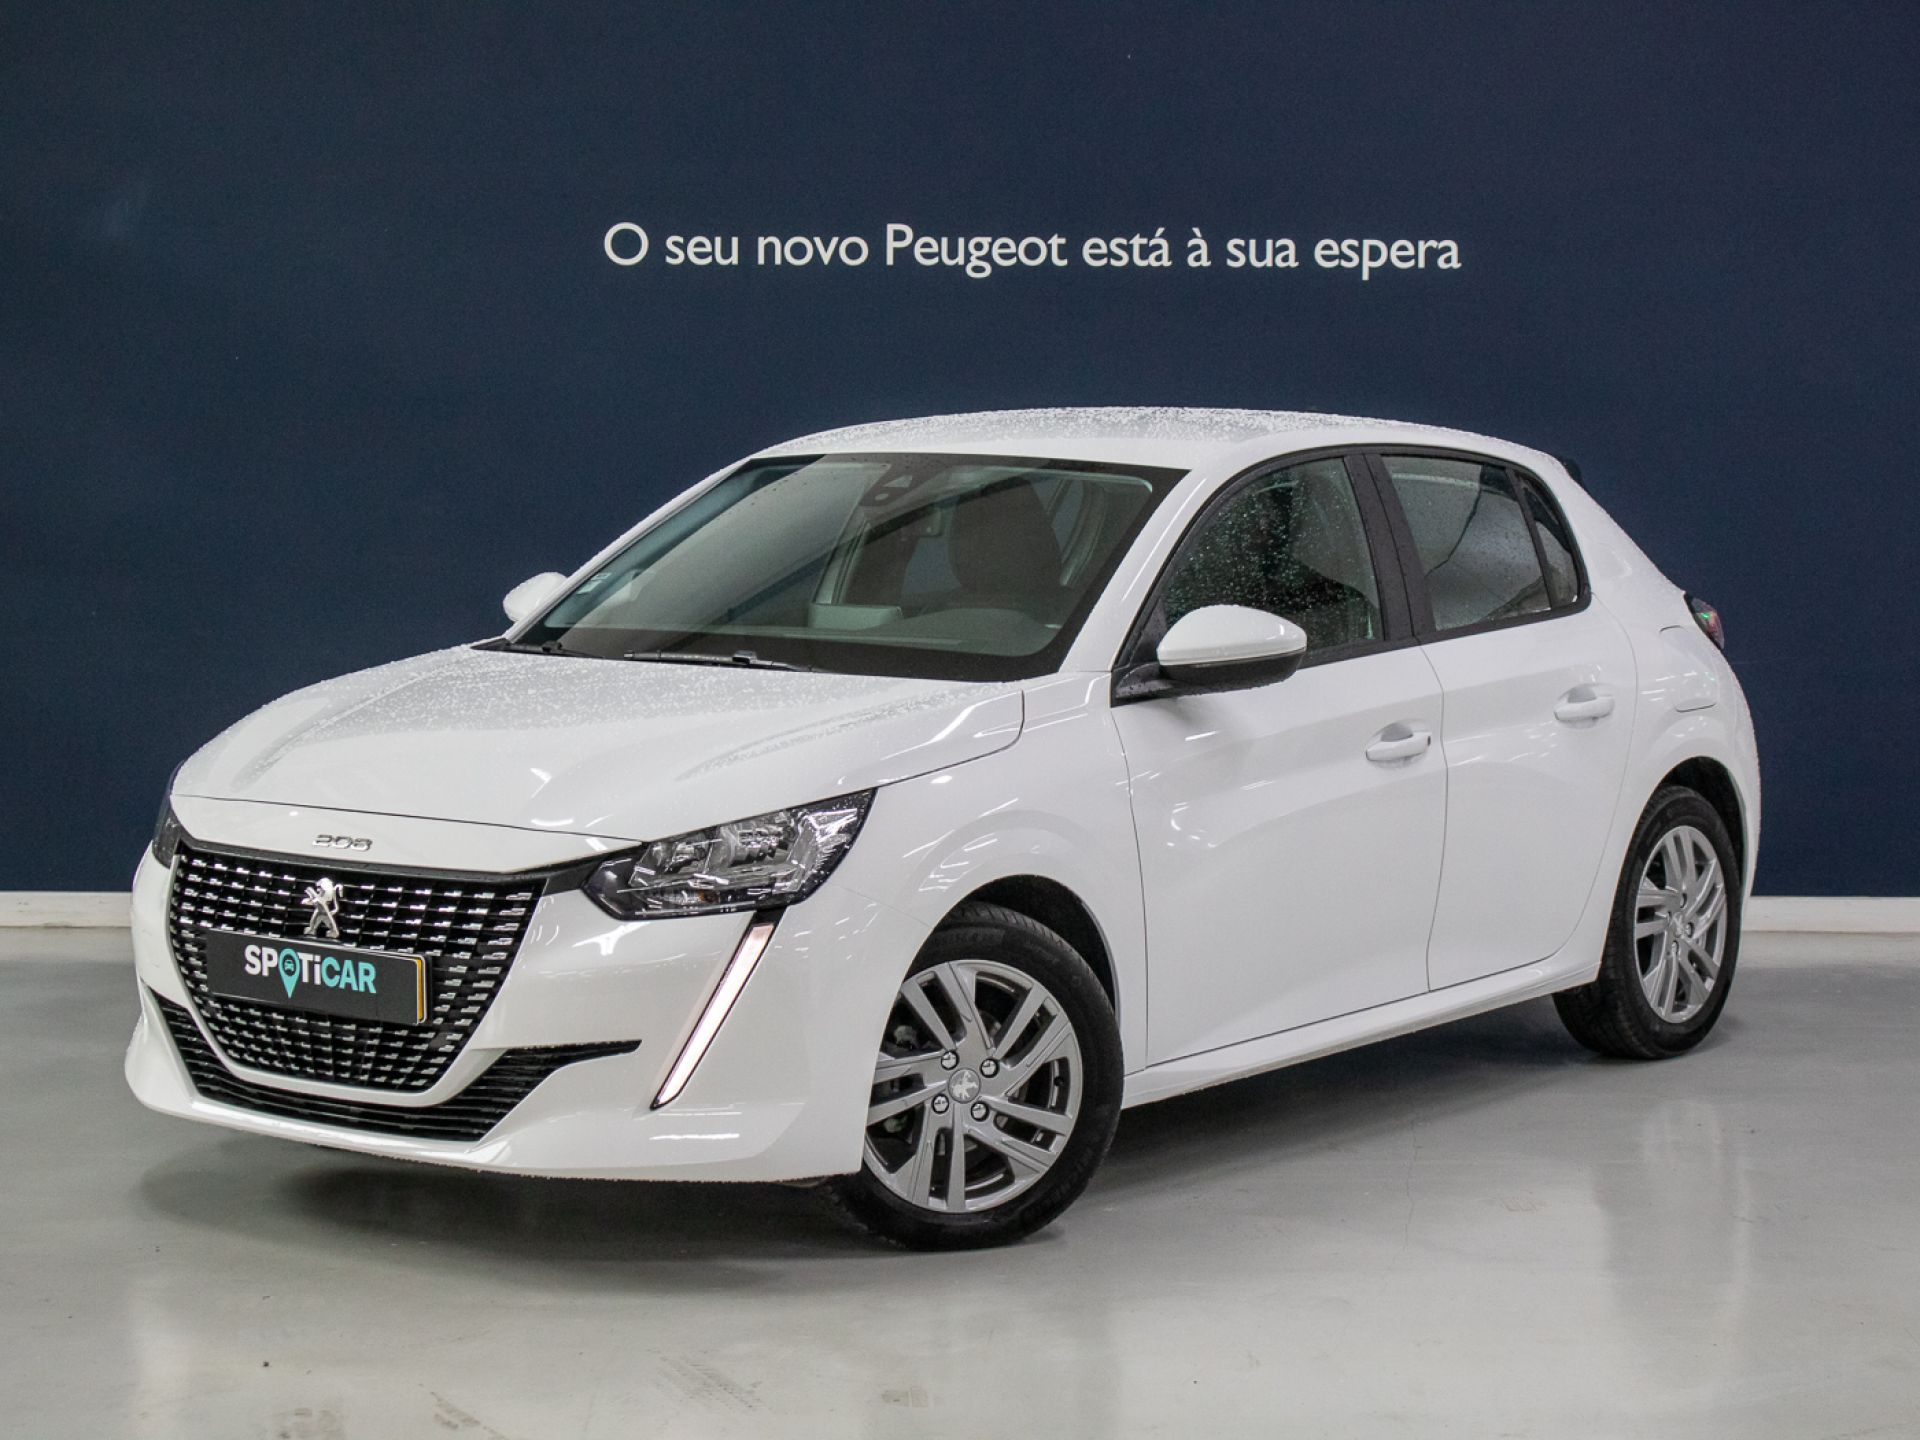 Peugeot 208 1.2 PureTech 75cv Active segunda mão Setúbal